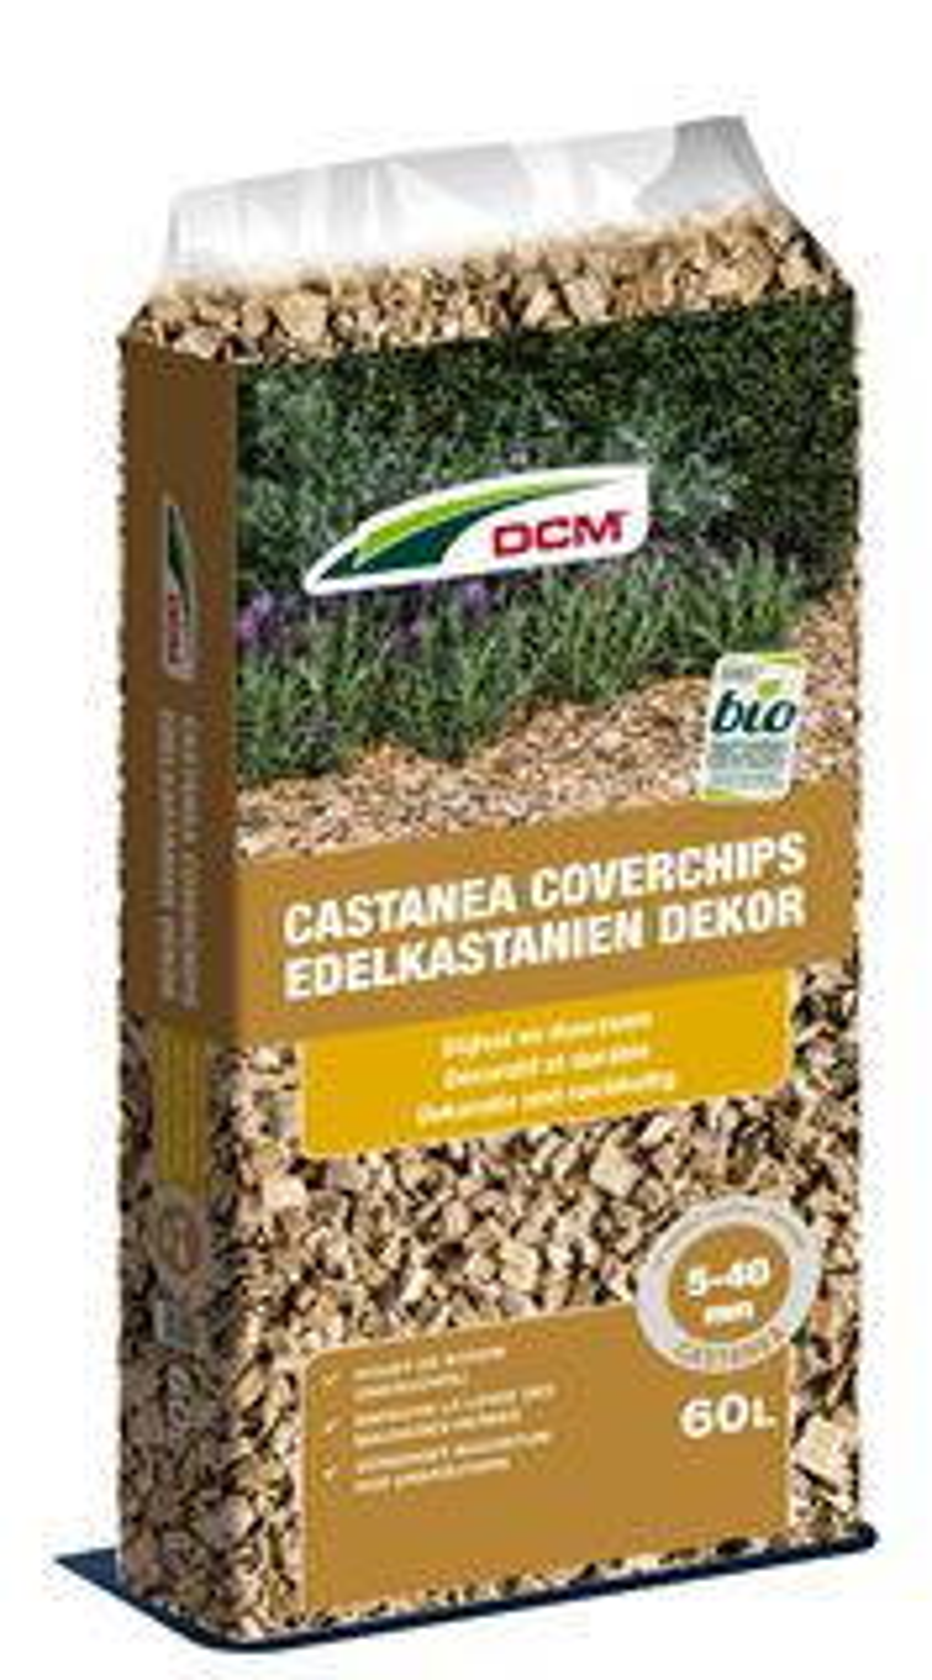 DCM-castanea-coverships-60L-Bio-houtsnippers-van-kastanjehout